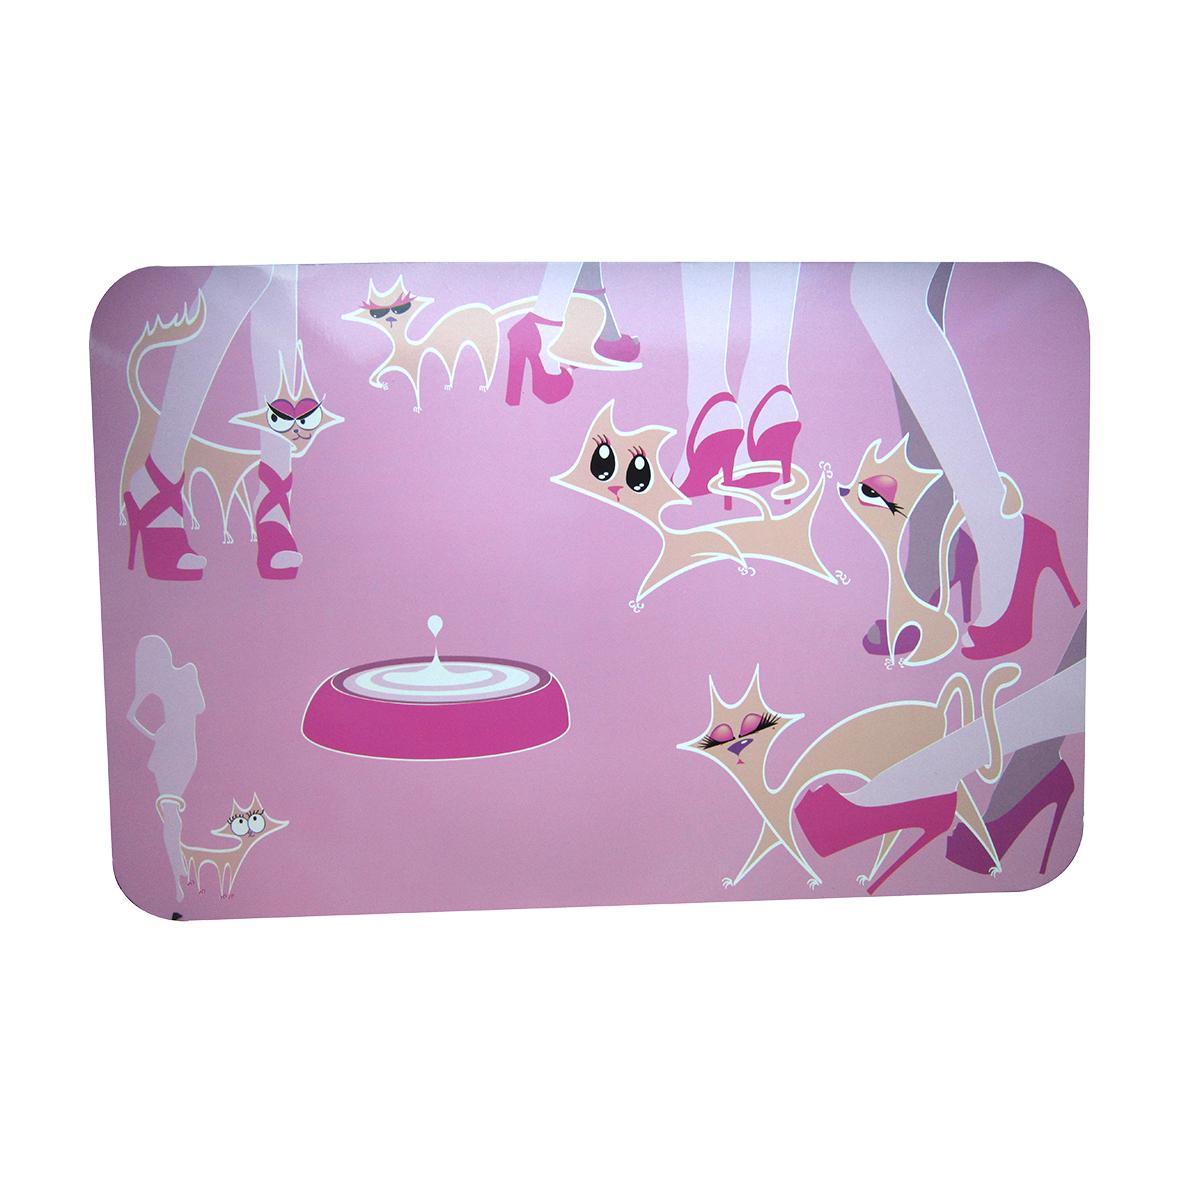 Pad Castron Pisici Glamour Pink 43x28 Cm imagine